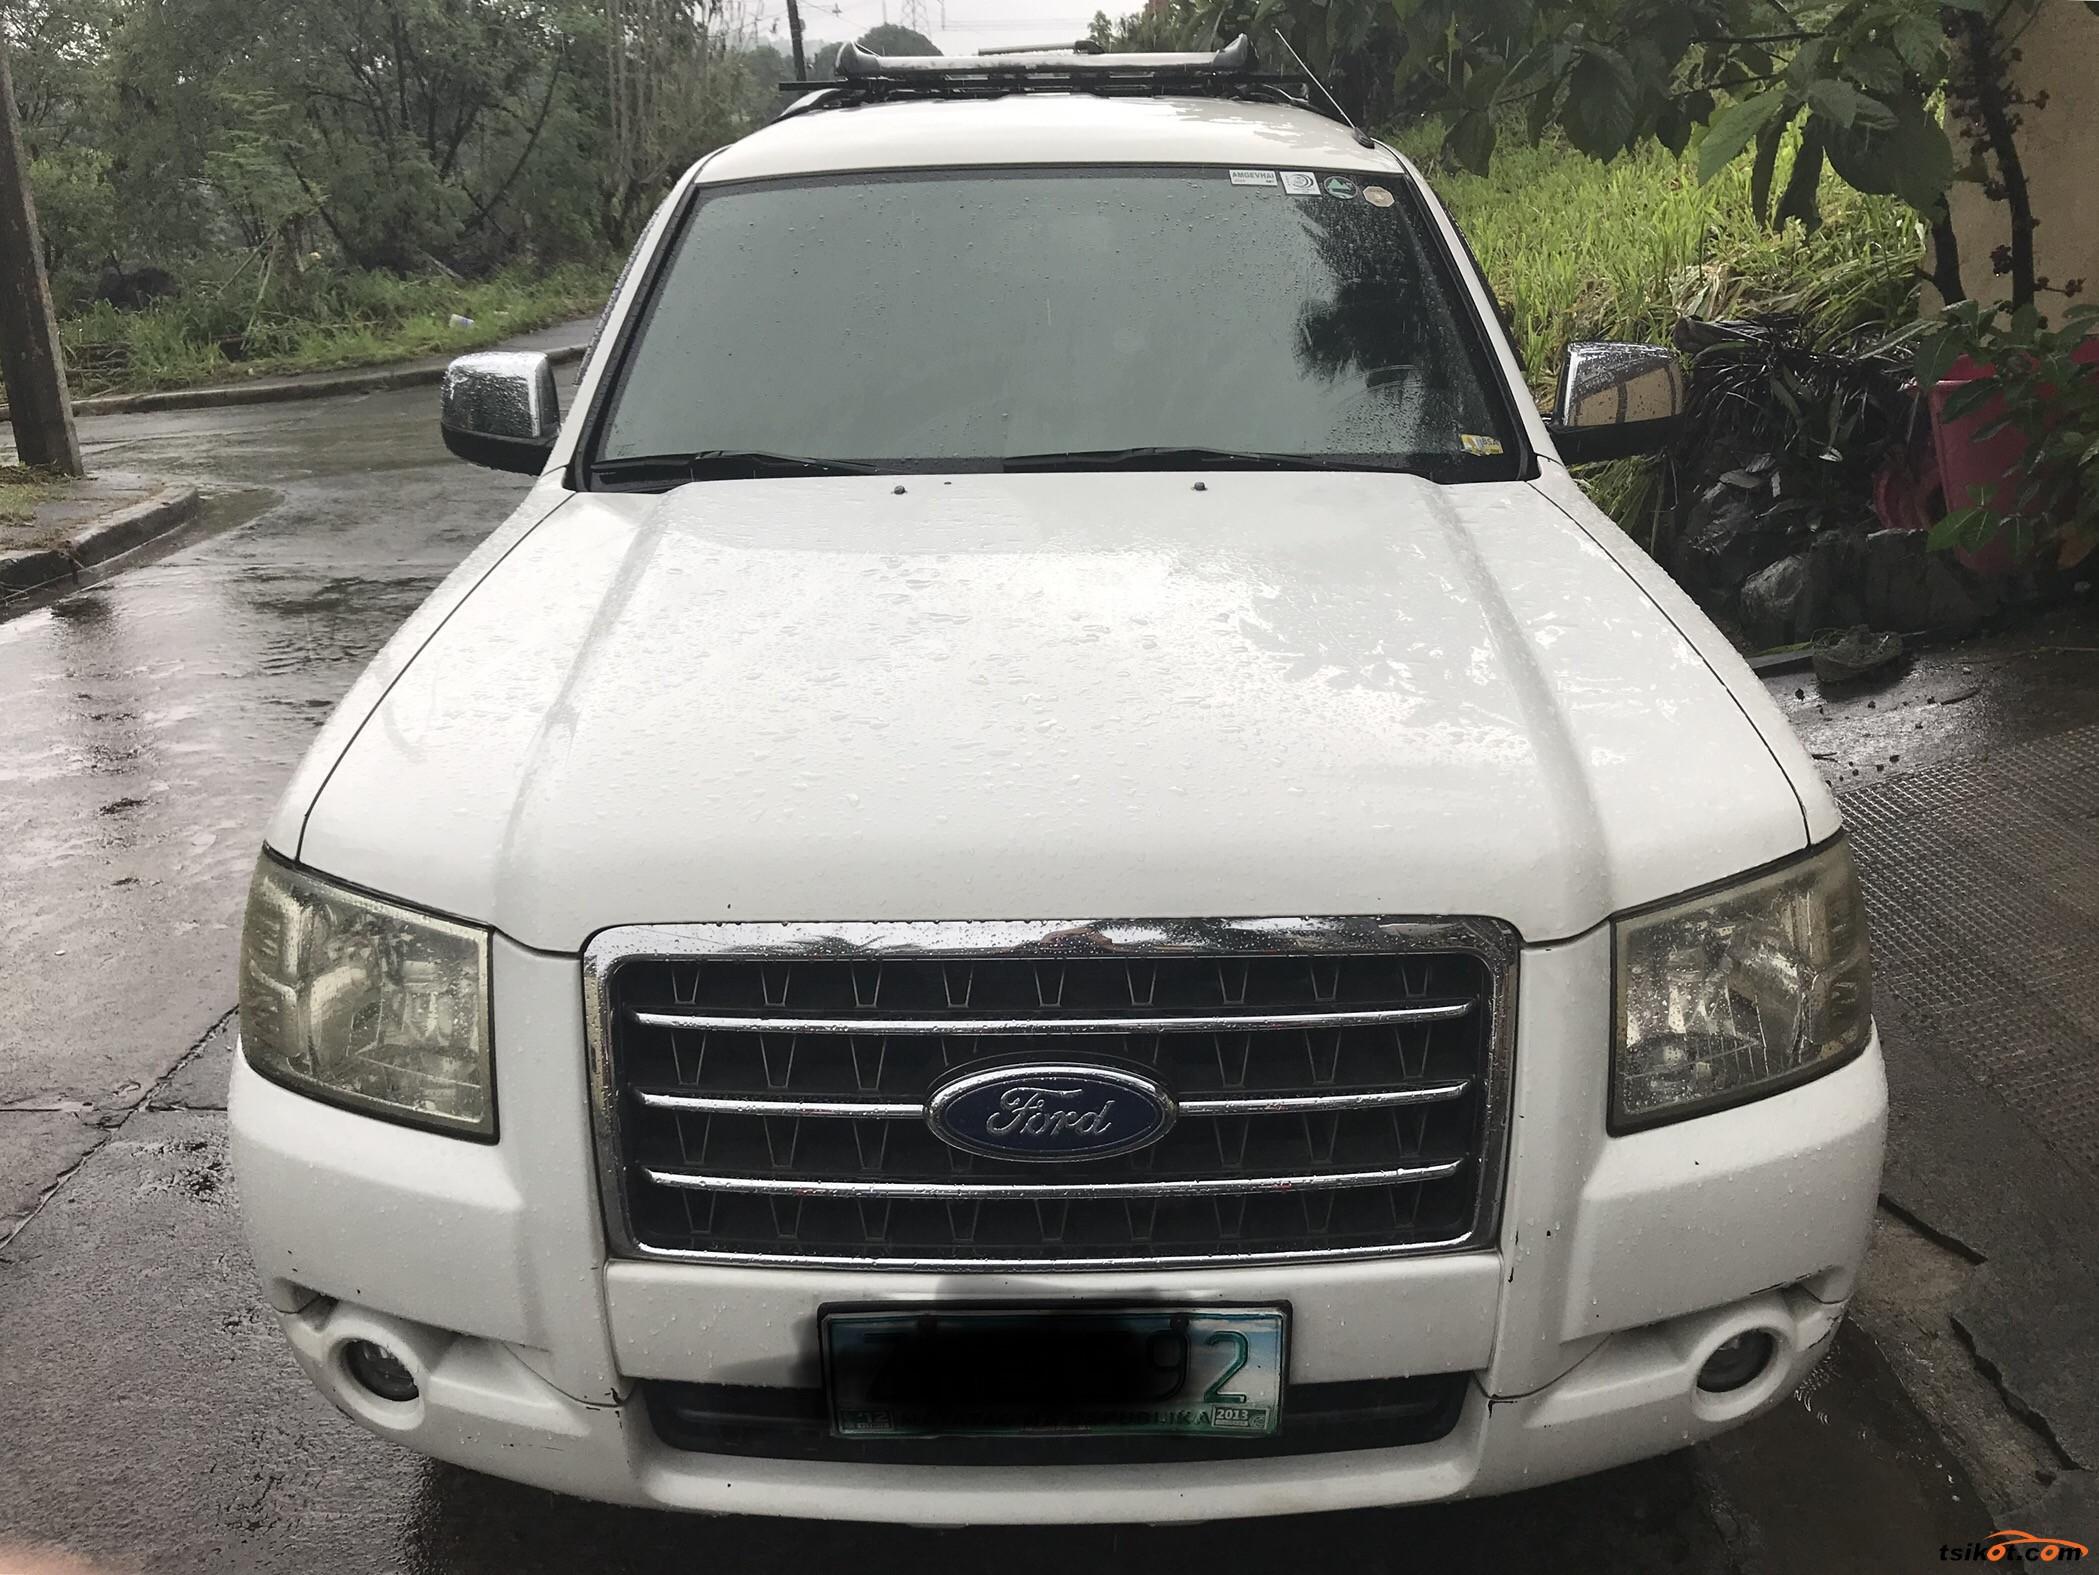 Ford Everest 2007 - 2